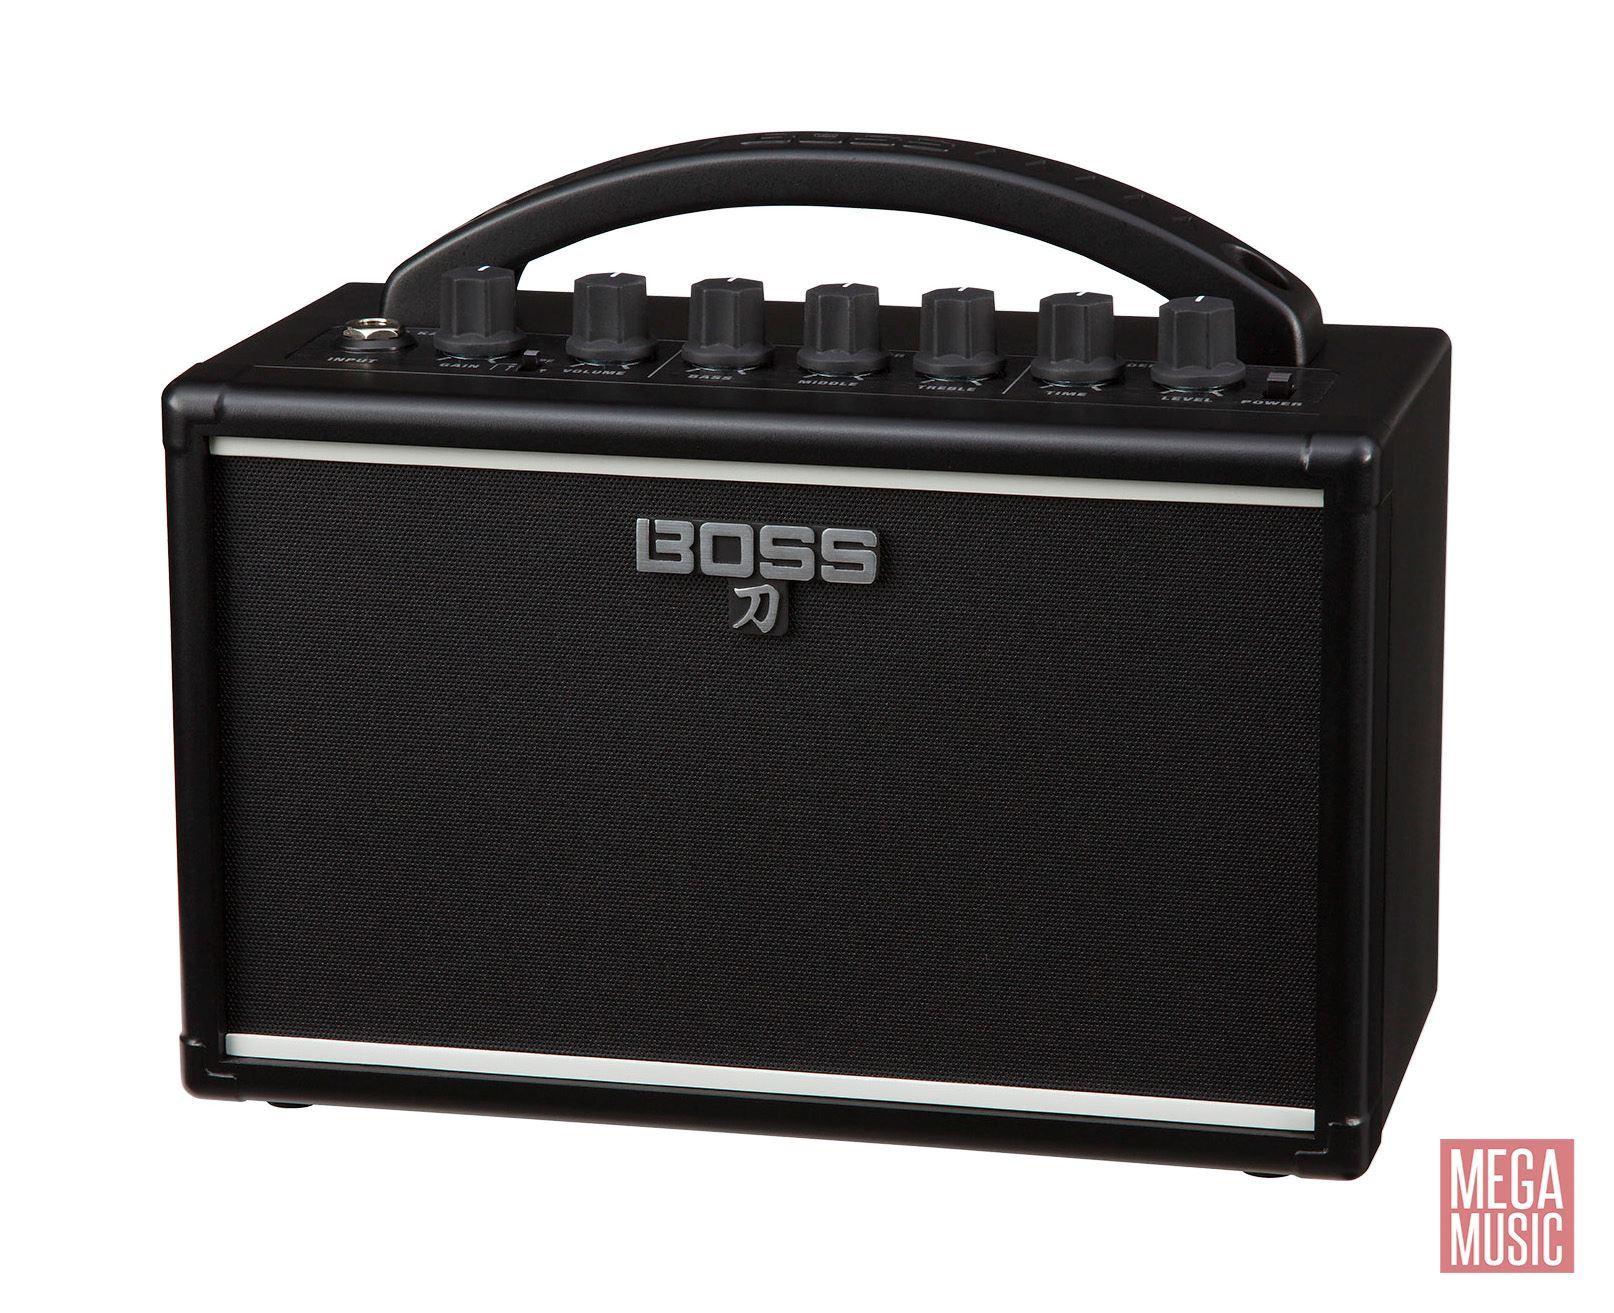 BOSS Katana-Mini Guitar Amplifier - front angle view